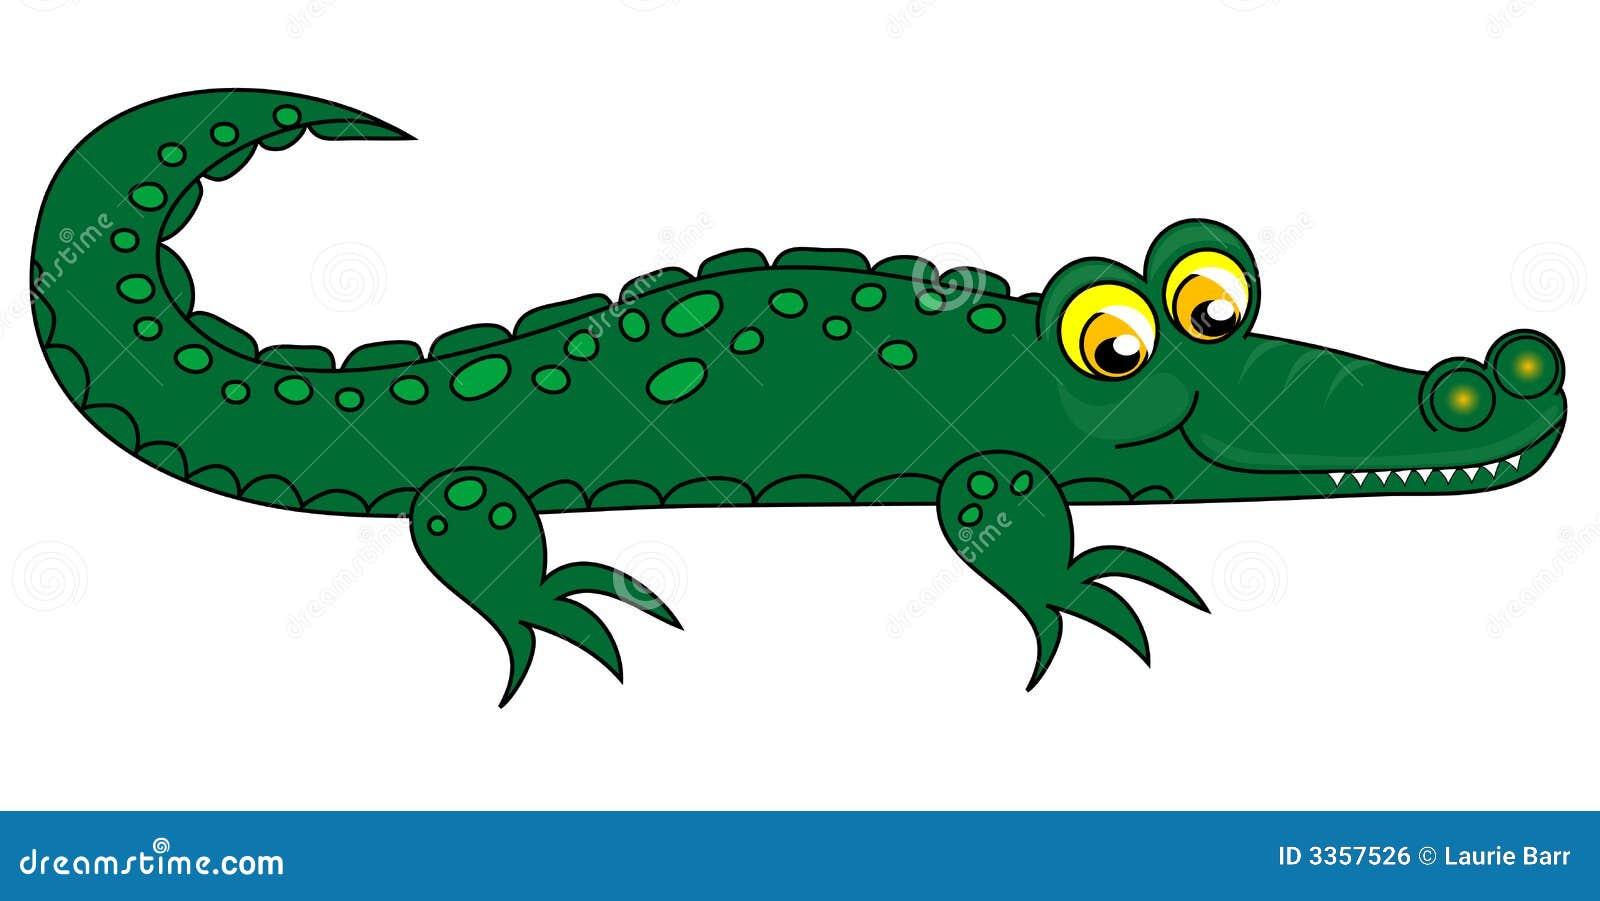 Clip Art Crocodile Clip Art crocodile clip art royalty free stock image 3357526 art